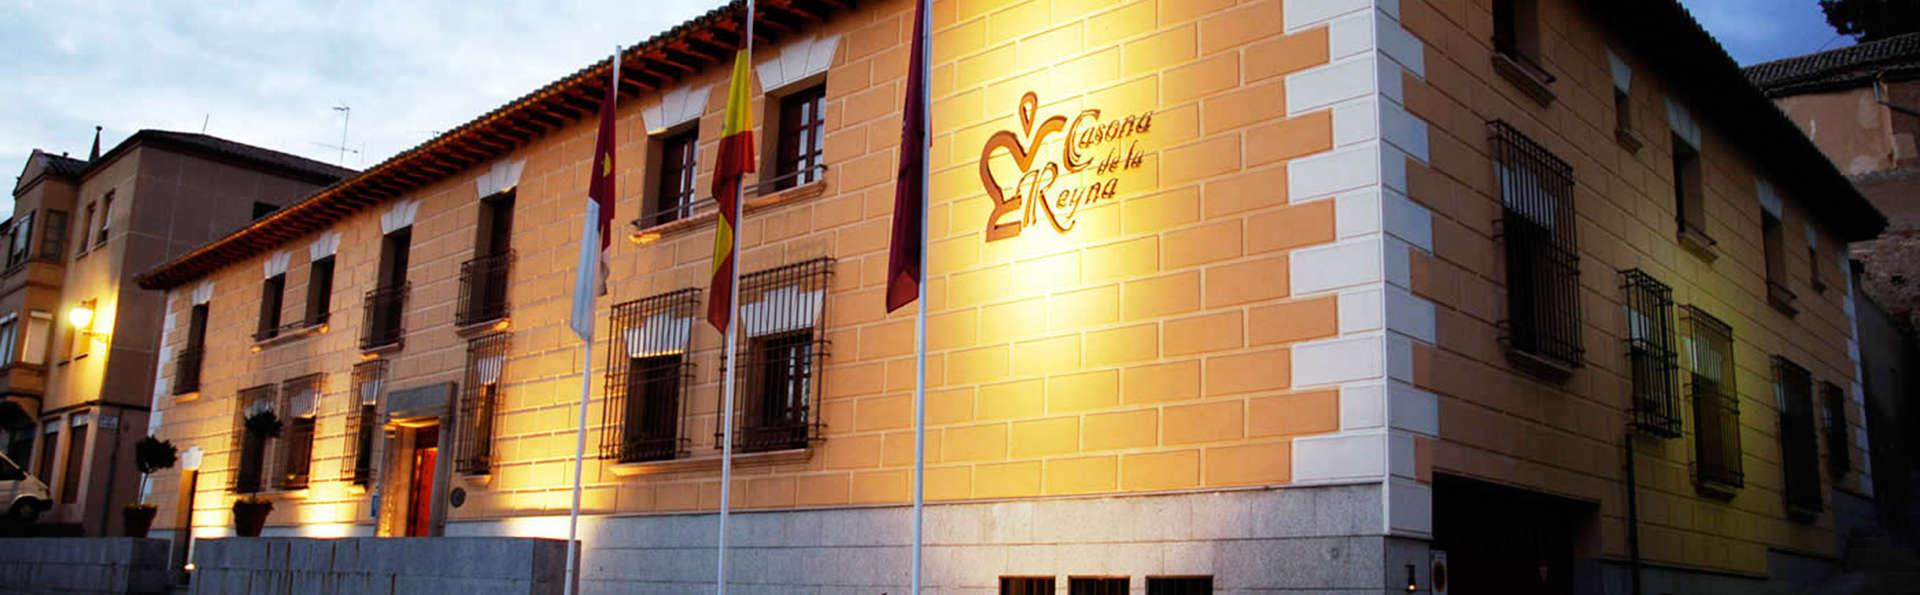 Hotel Casona de la Reyna - EDIT_front2.jpg